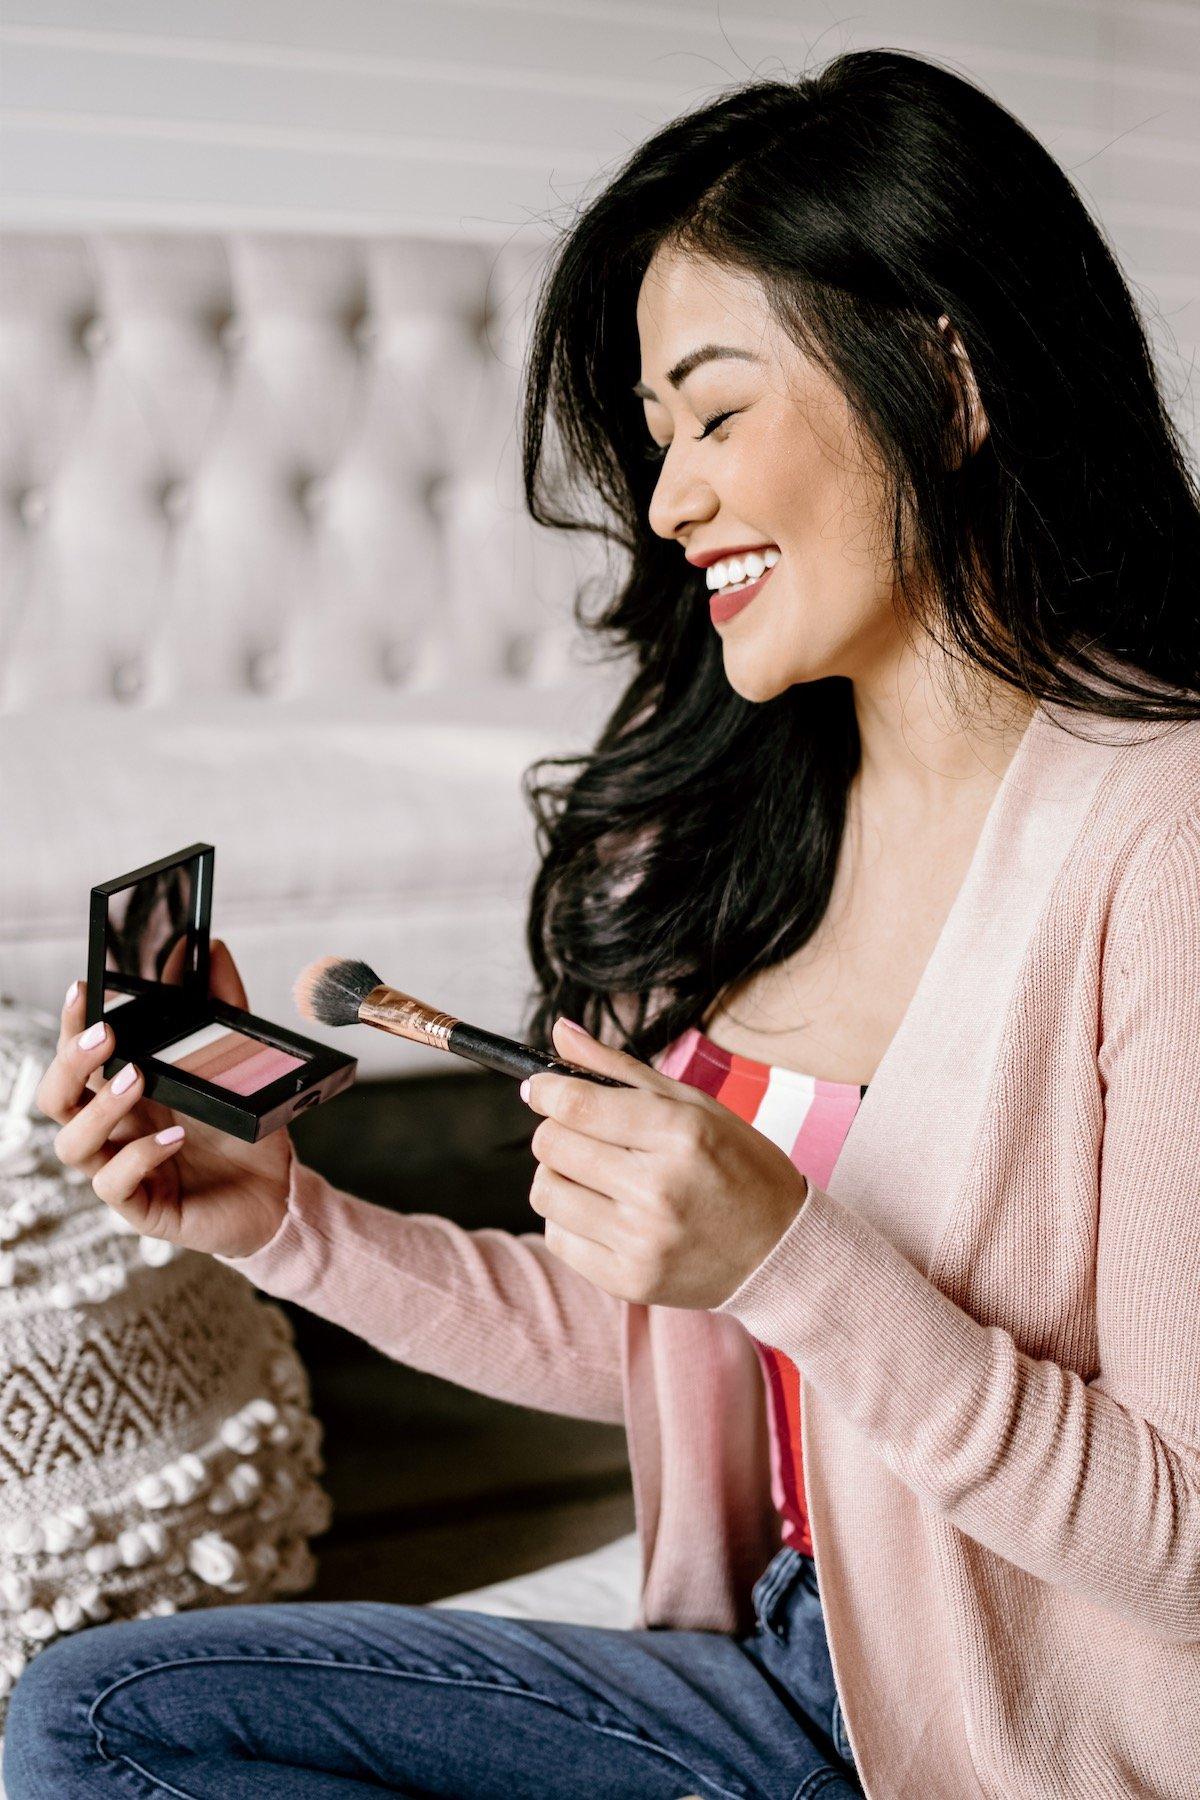 woman applying bobbi brown shimmer brick blush and smiling